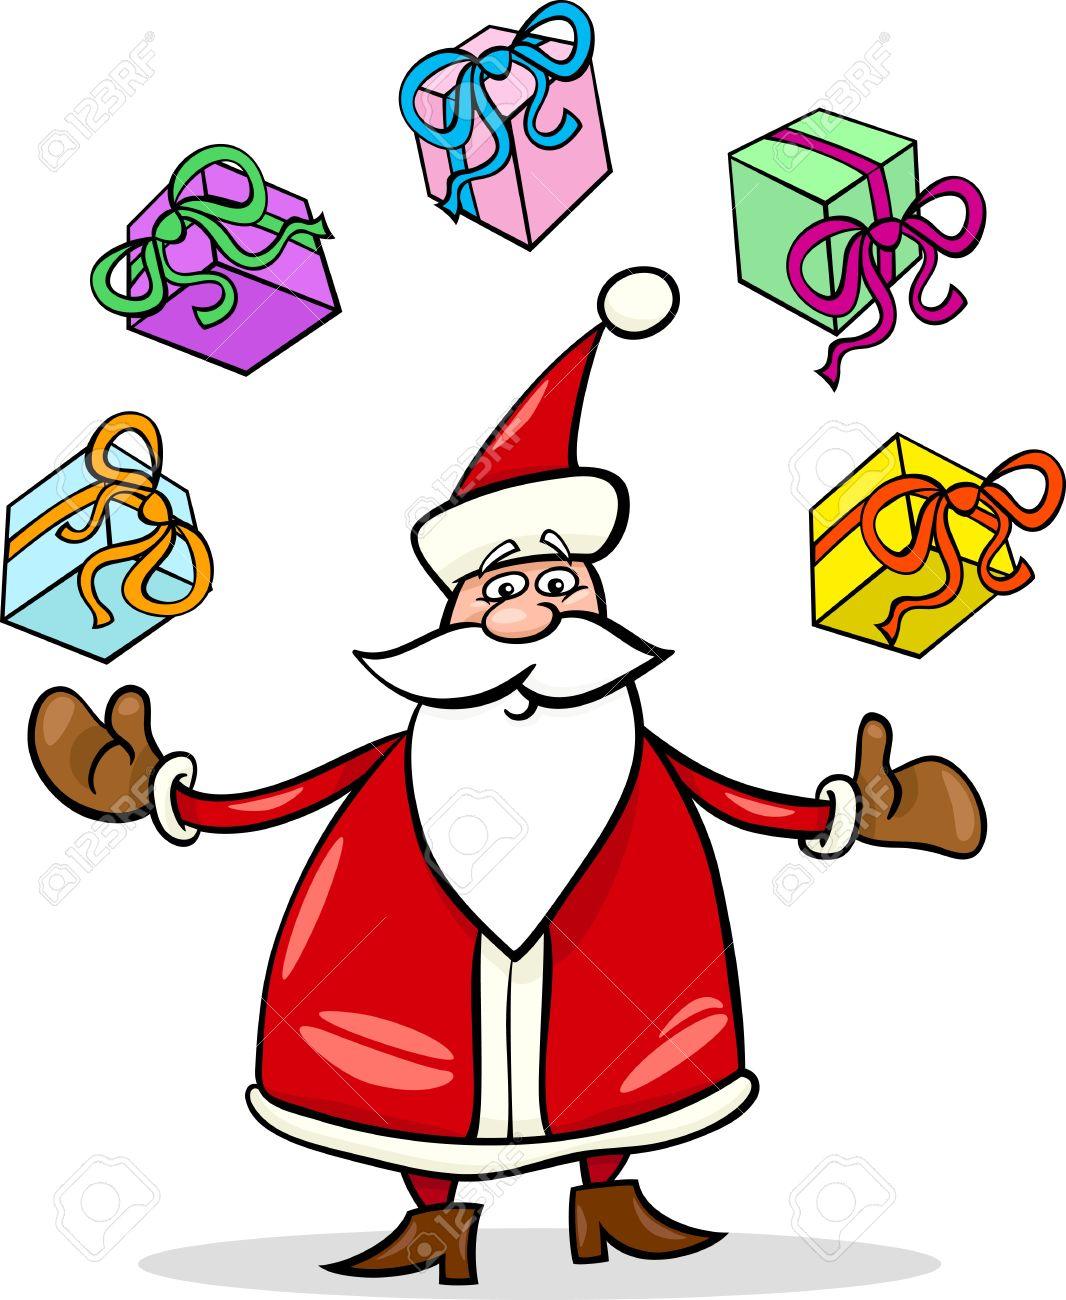 Cartoon Illustration of Funny Santa Claus or Papa Noel juggling Christmas Presents and Gifts Stock Vector - 16002031